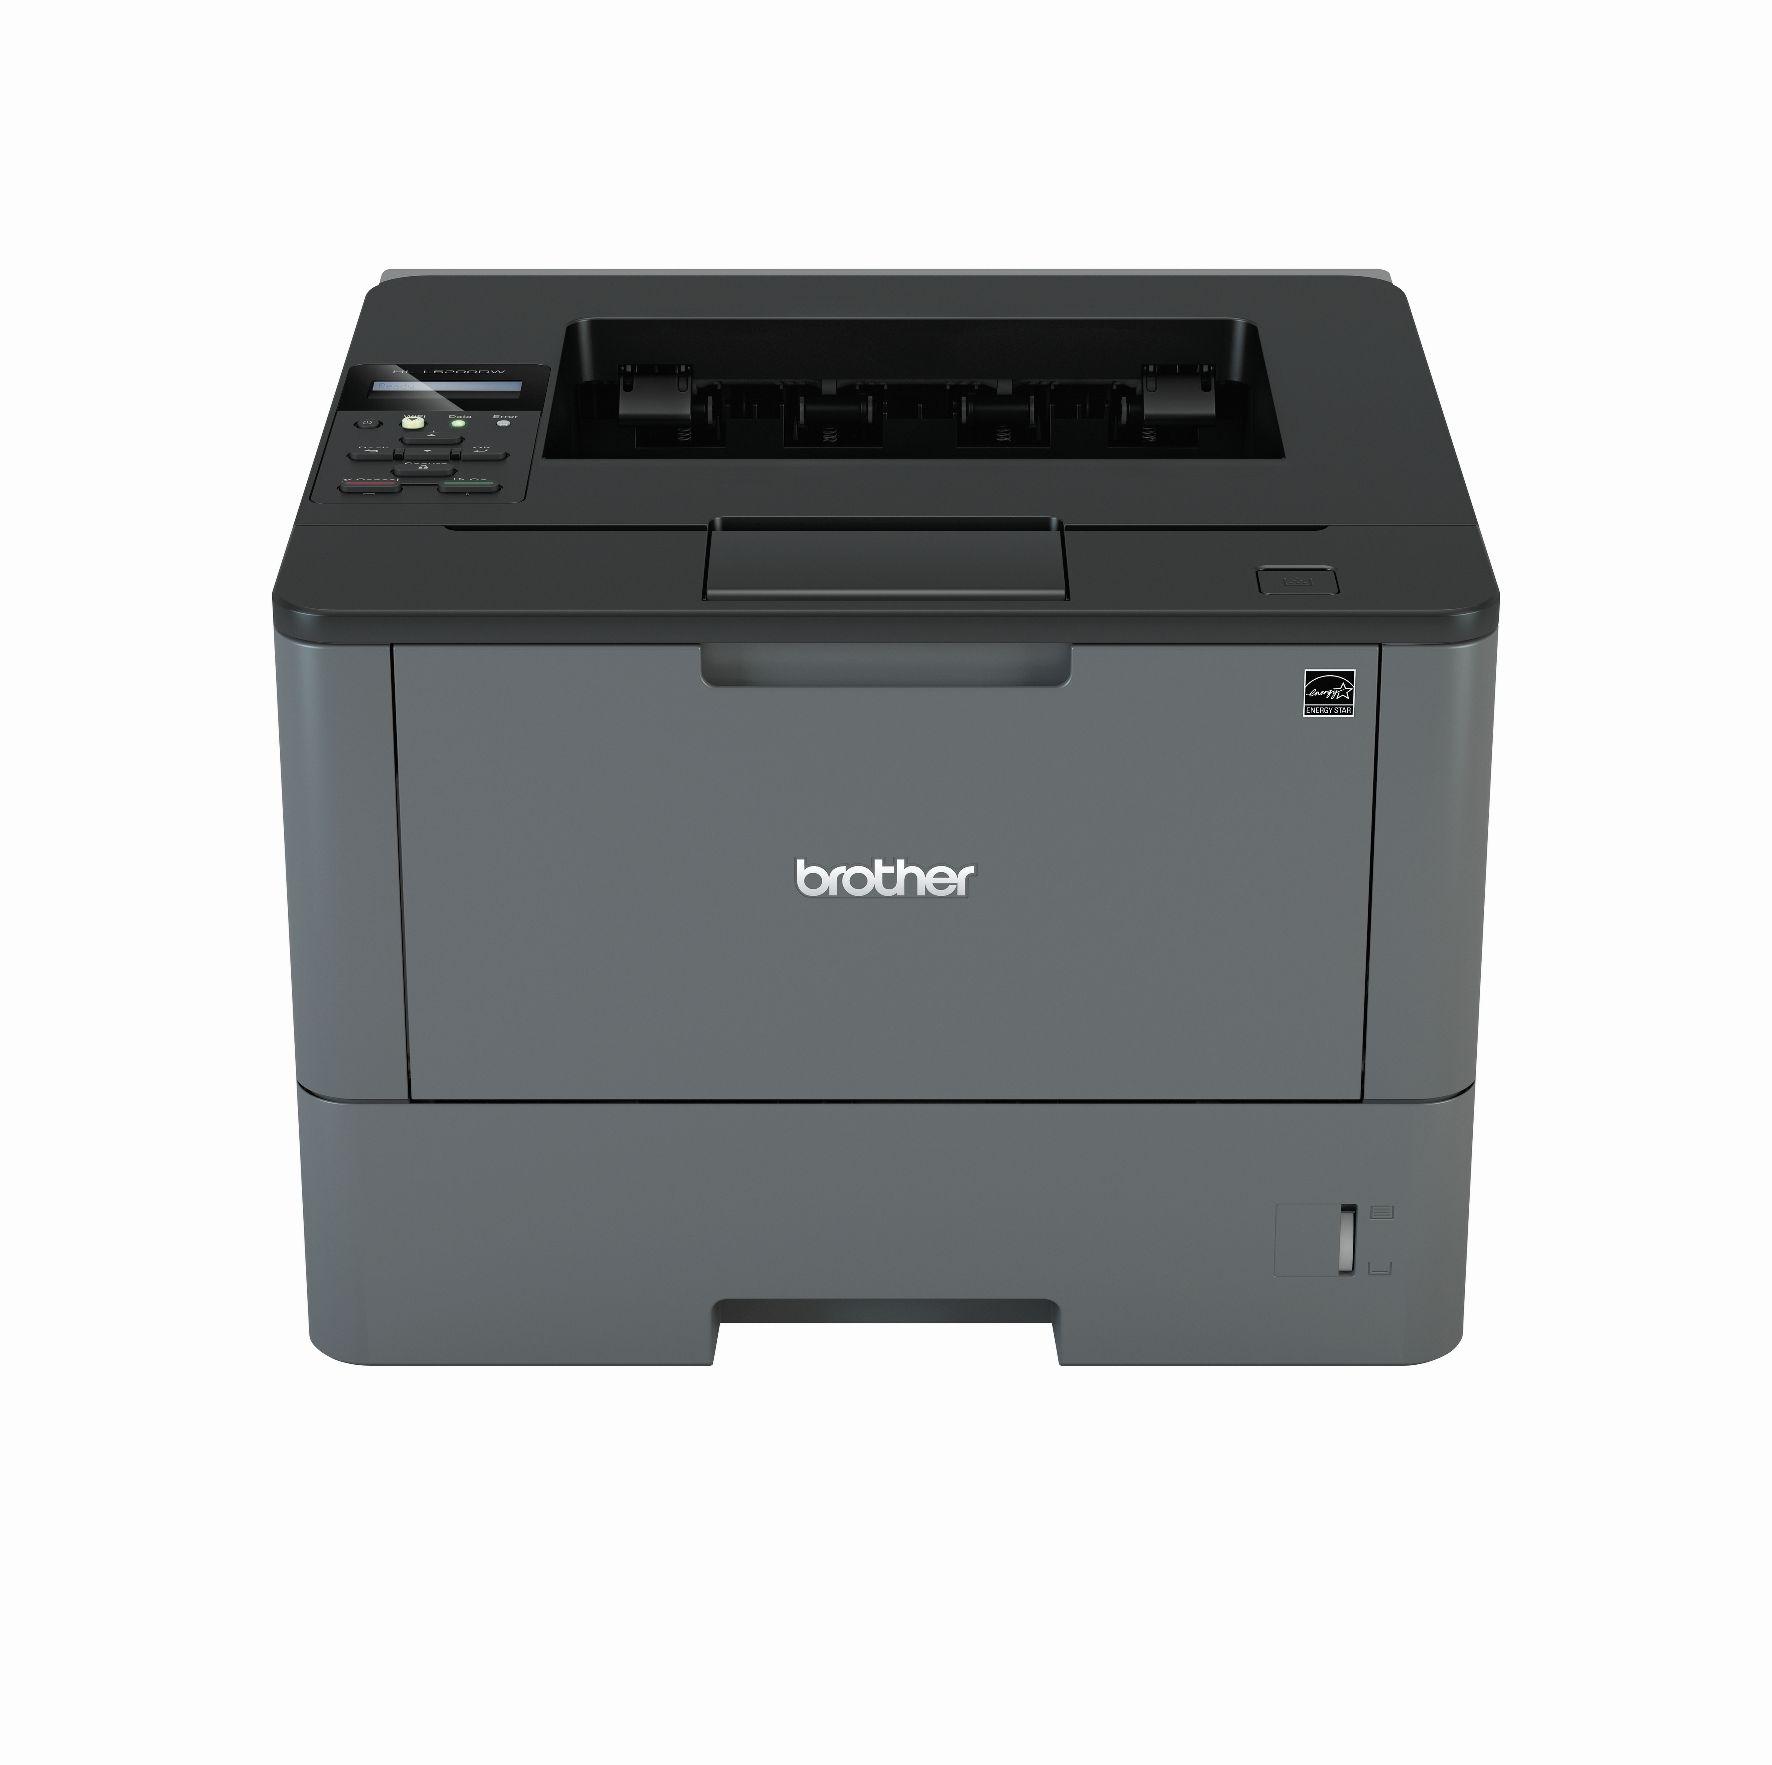 ORIGINAL Brother Drucker  HL-L5200DW HLL5200DWG1 Brother HL-L5200DW S/W-Laserdrucker